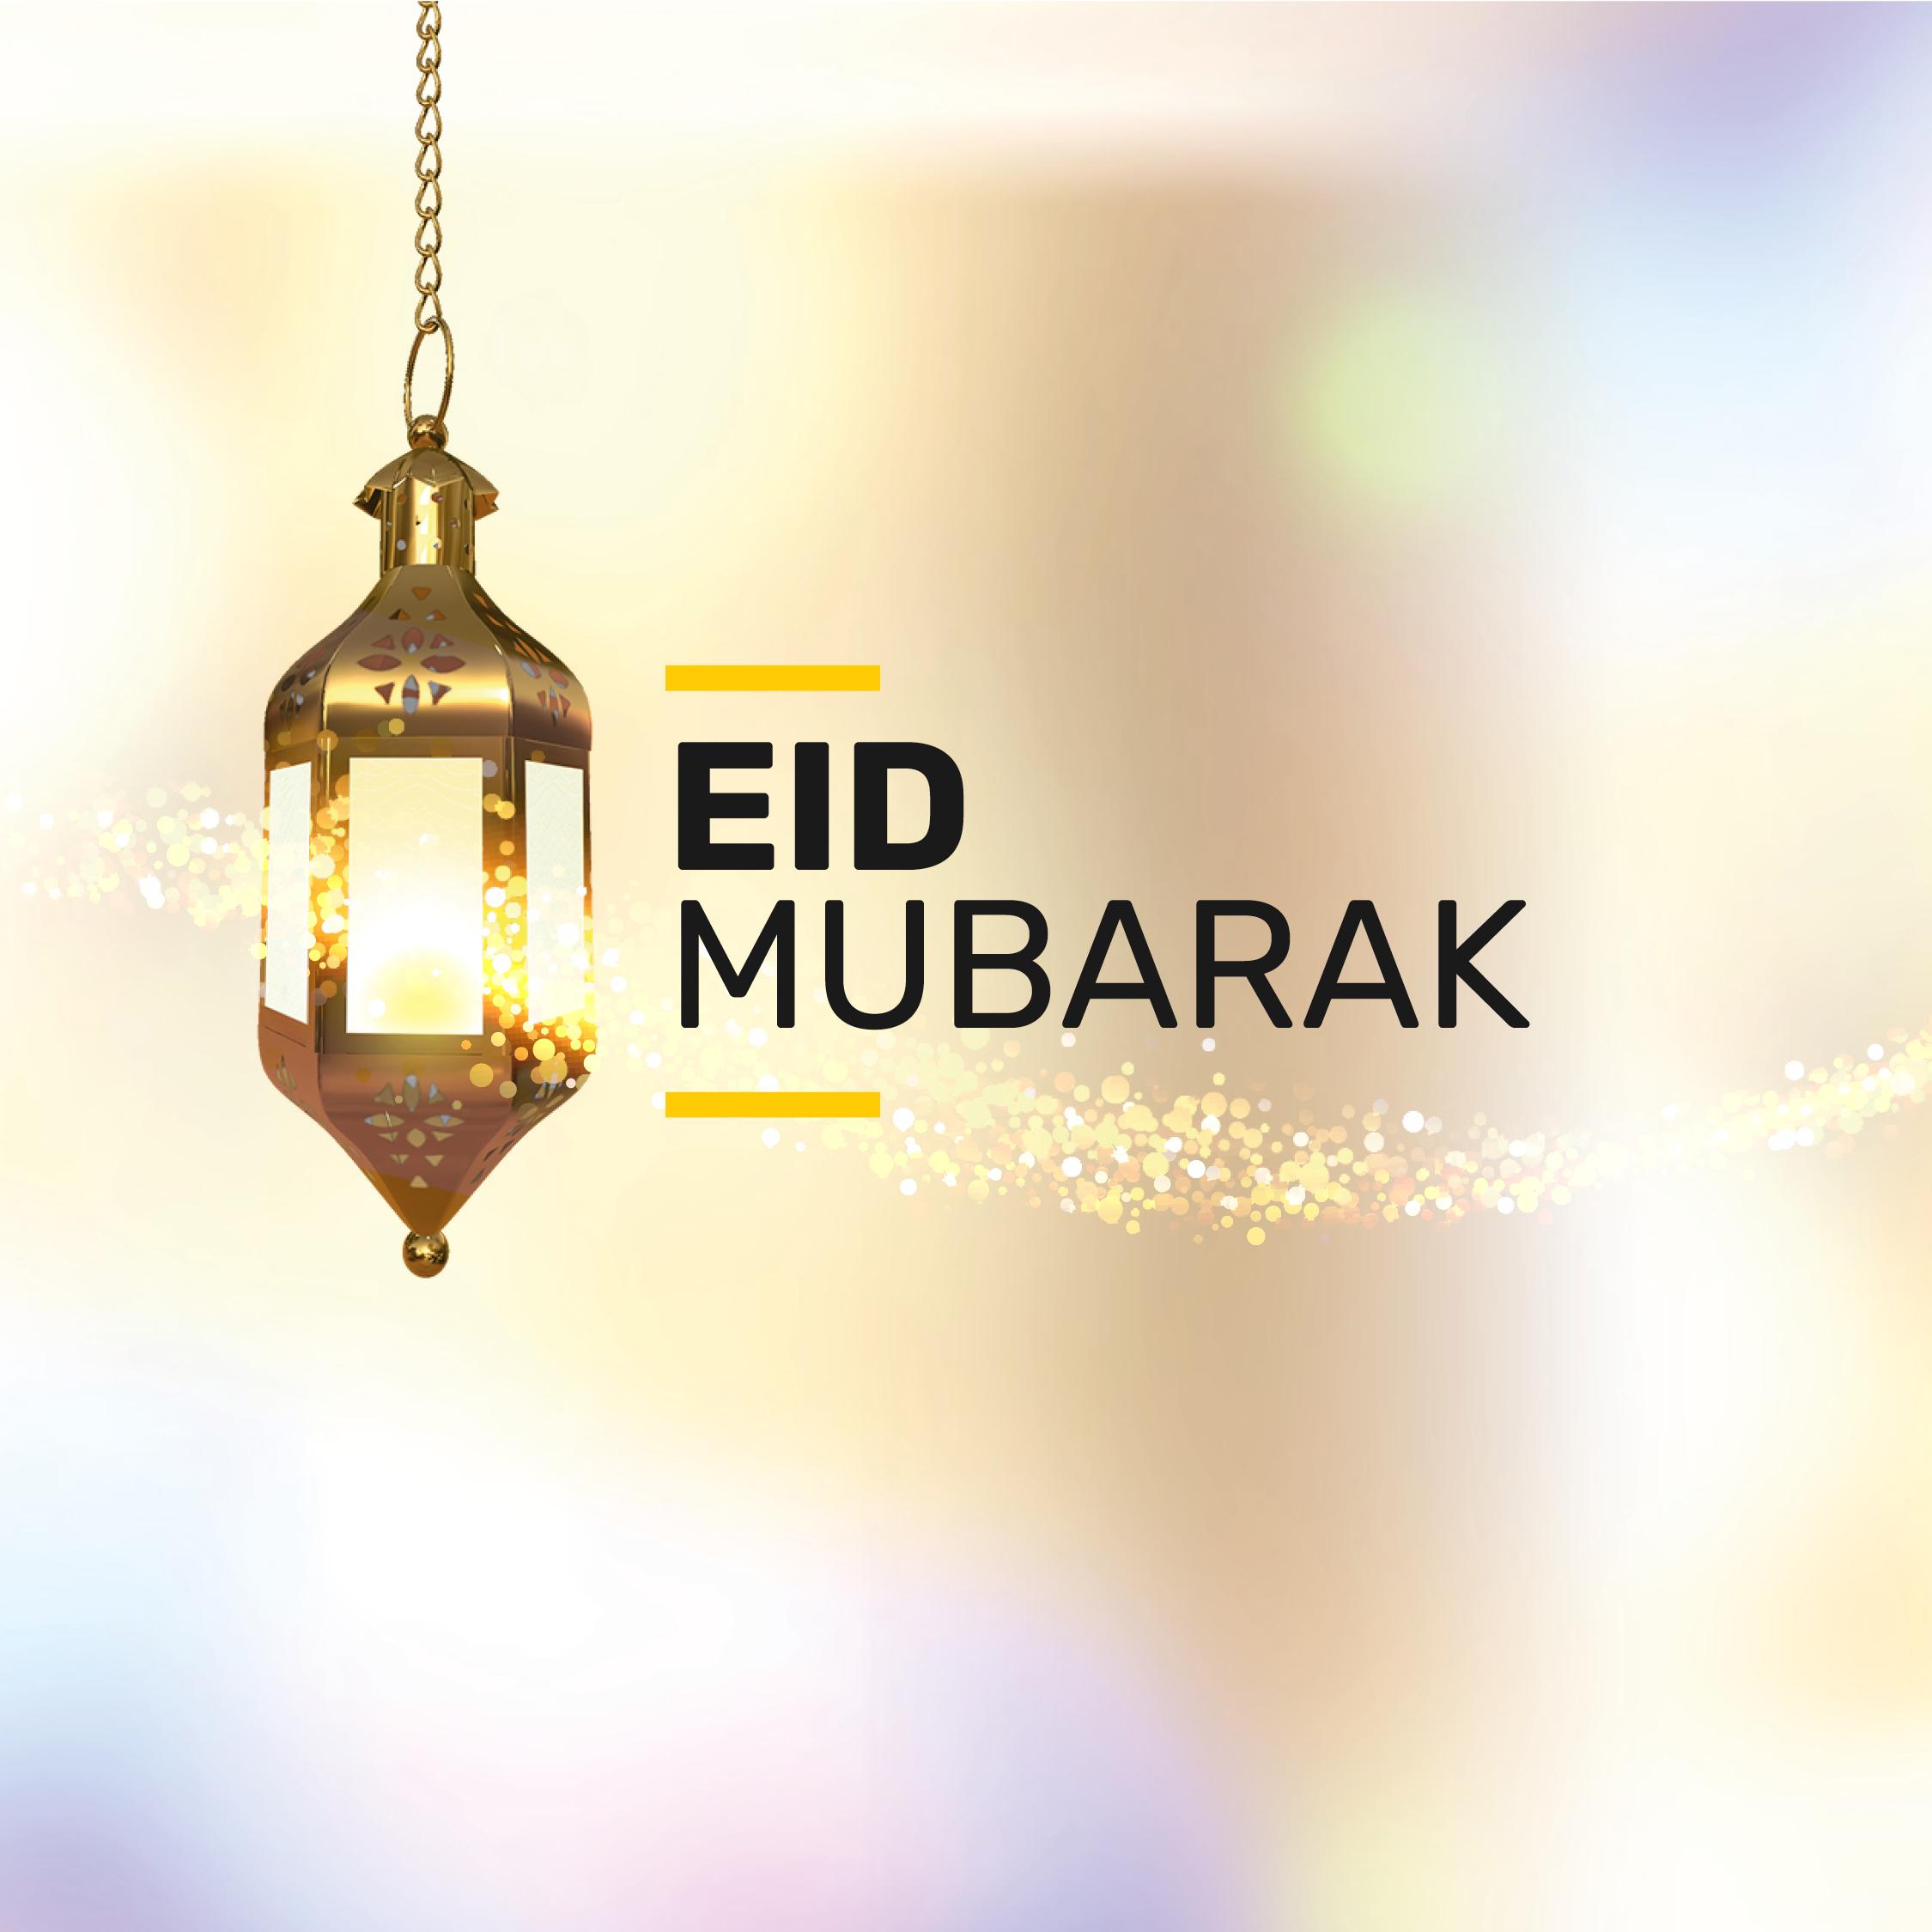 Eid Mubarak from Islam Channel - this year Eid al-Adha commences on Tuesday 20th July